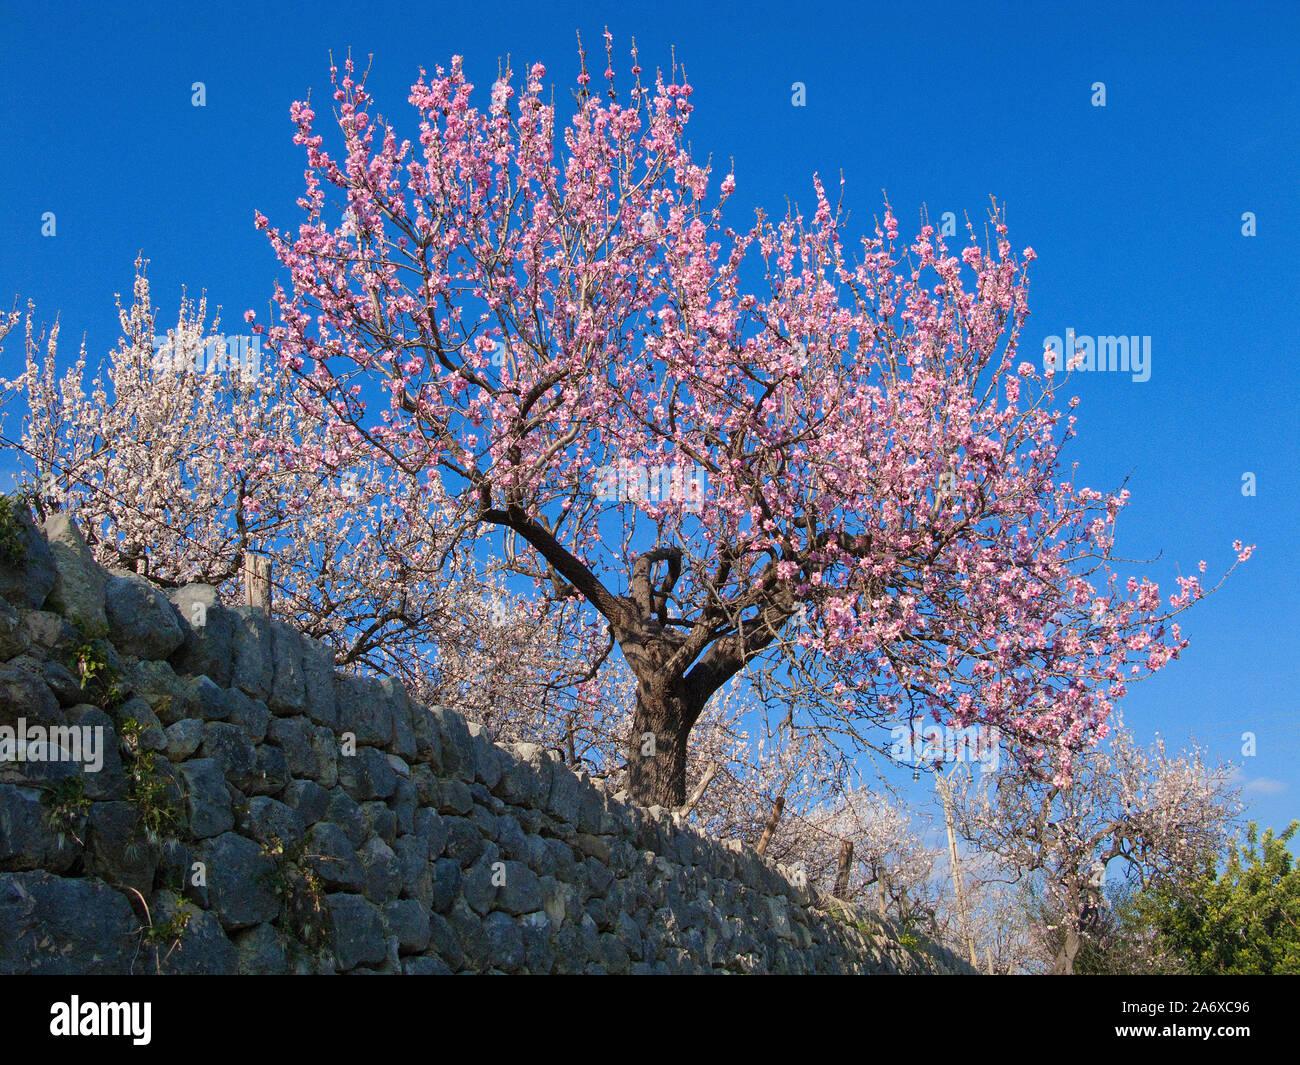 Prosperous Almond trees (Prunus dulcis) at Selva, almond blossom, Serra de Tramuntana, Mallorca, Balearics, Baleraric island, Spain Stock Photo